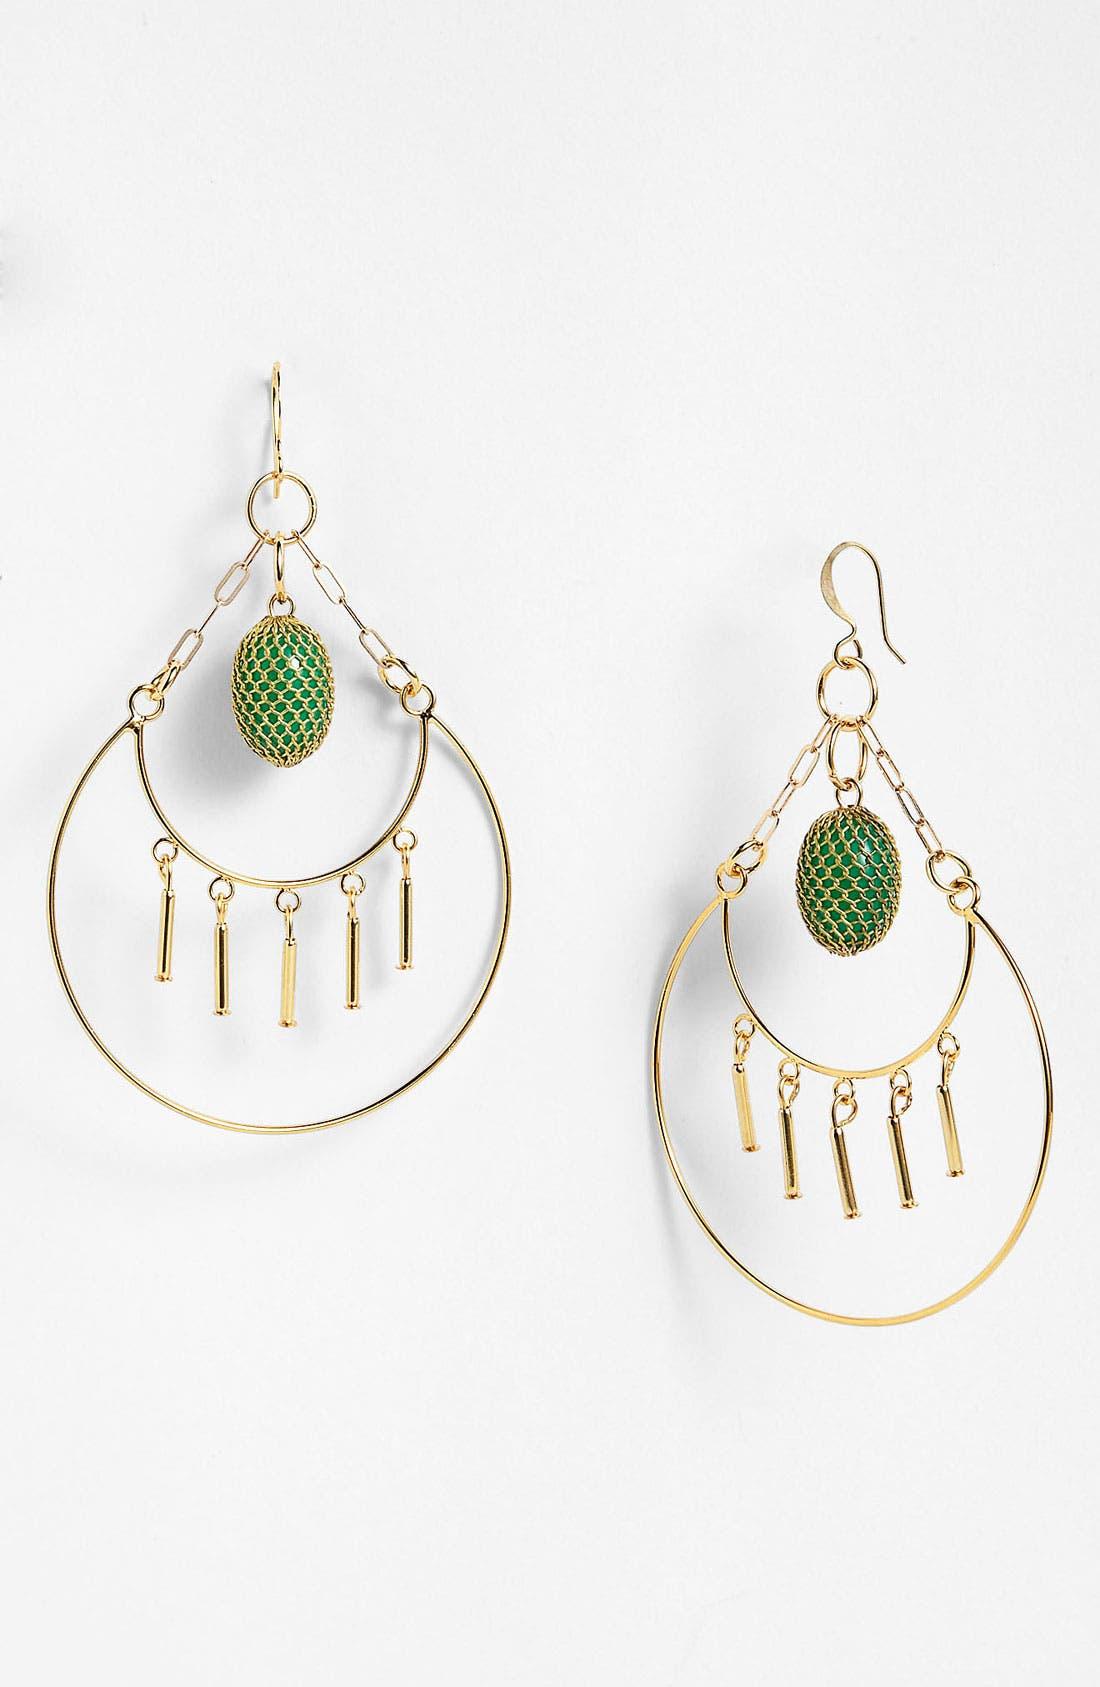 Main Image - Verdier Jewelry 'Green Mesh' Chandelier Earrings (Nordstrom Exclusive)